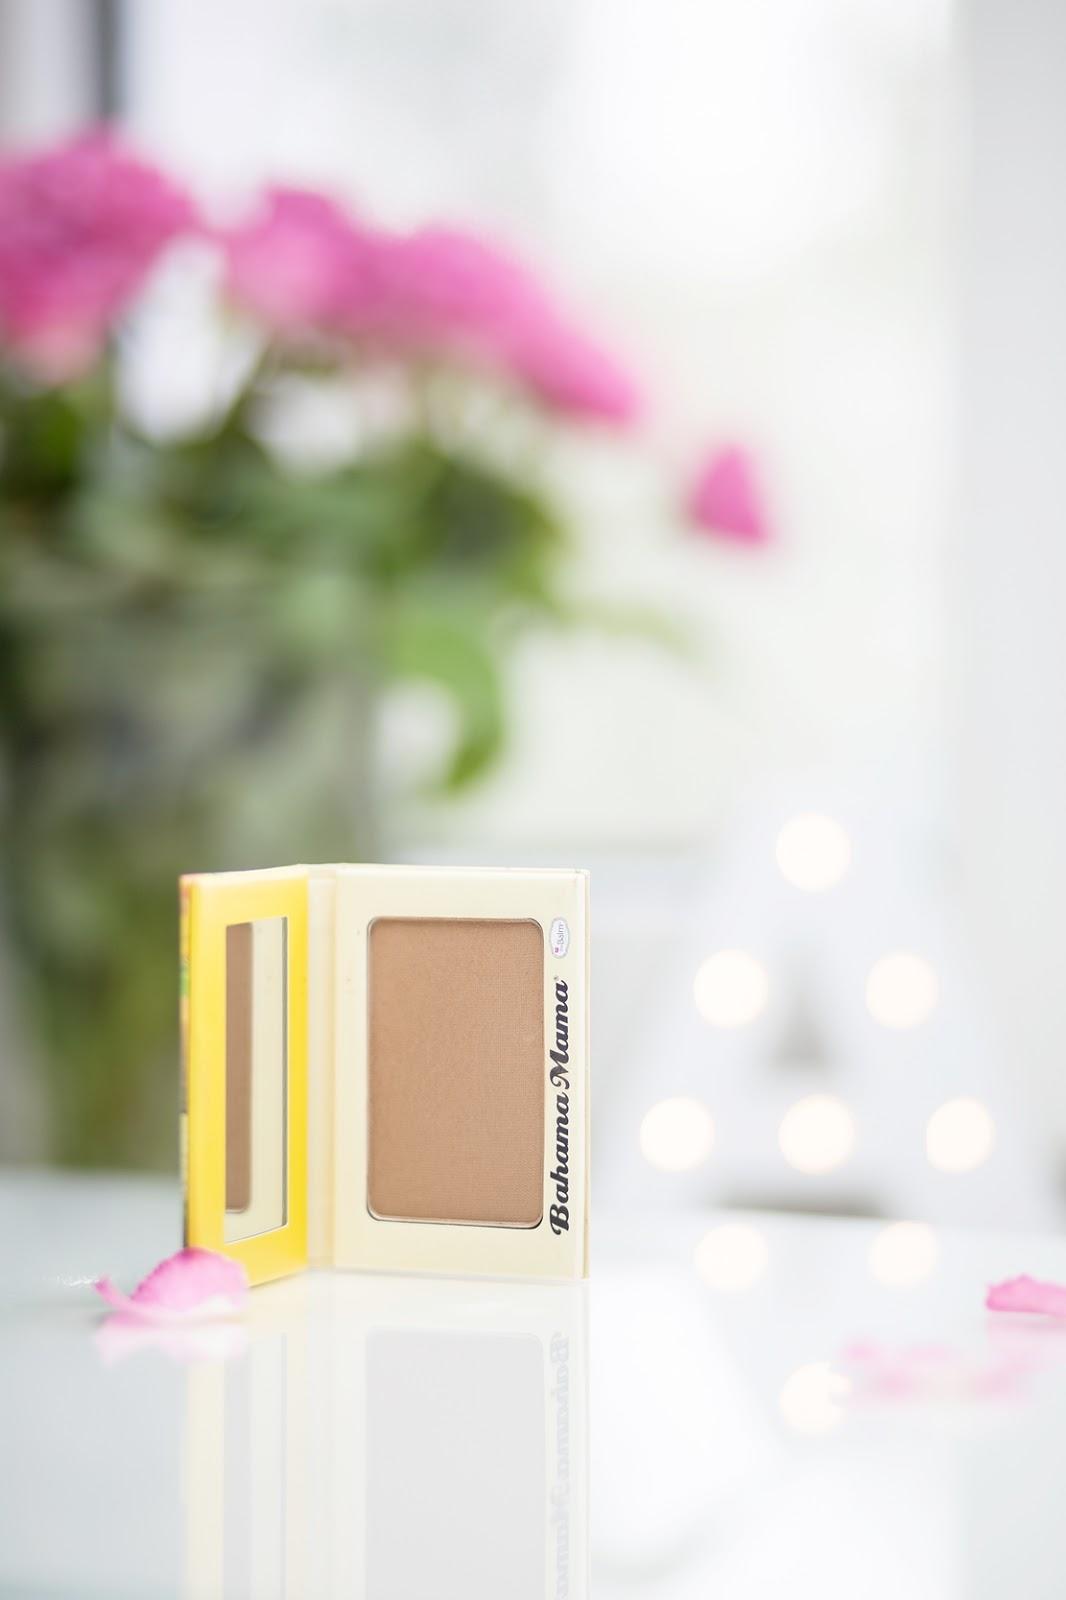 blog modowy lifestylowy o kosmetykach